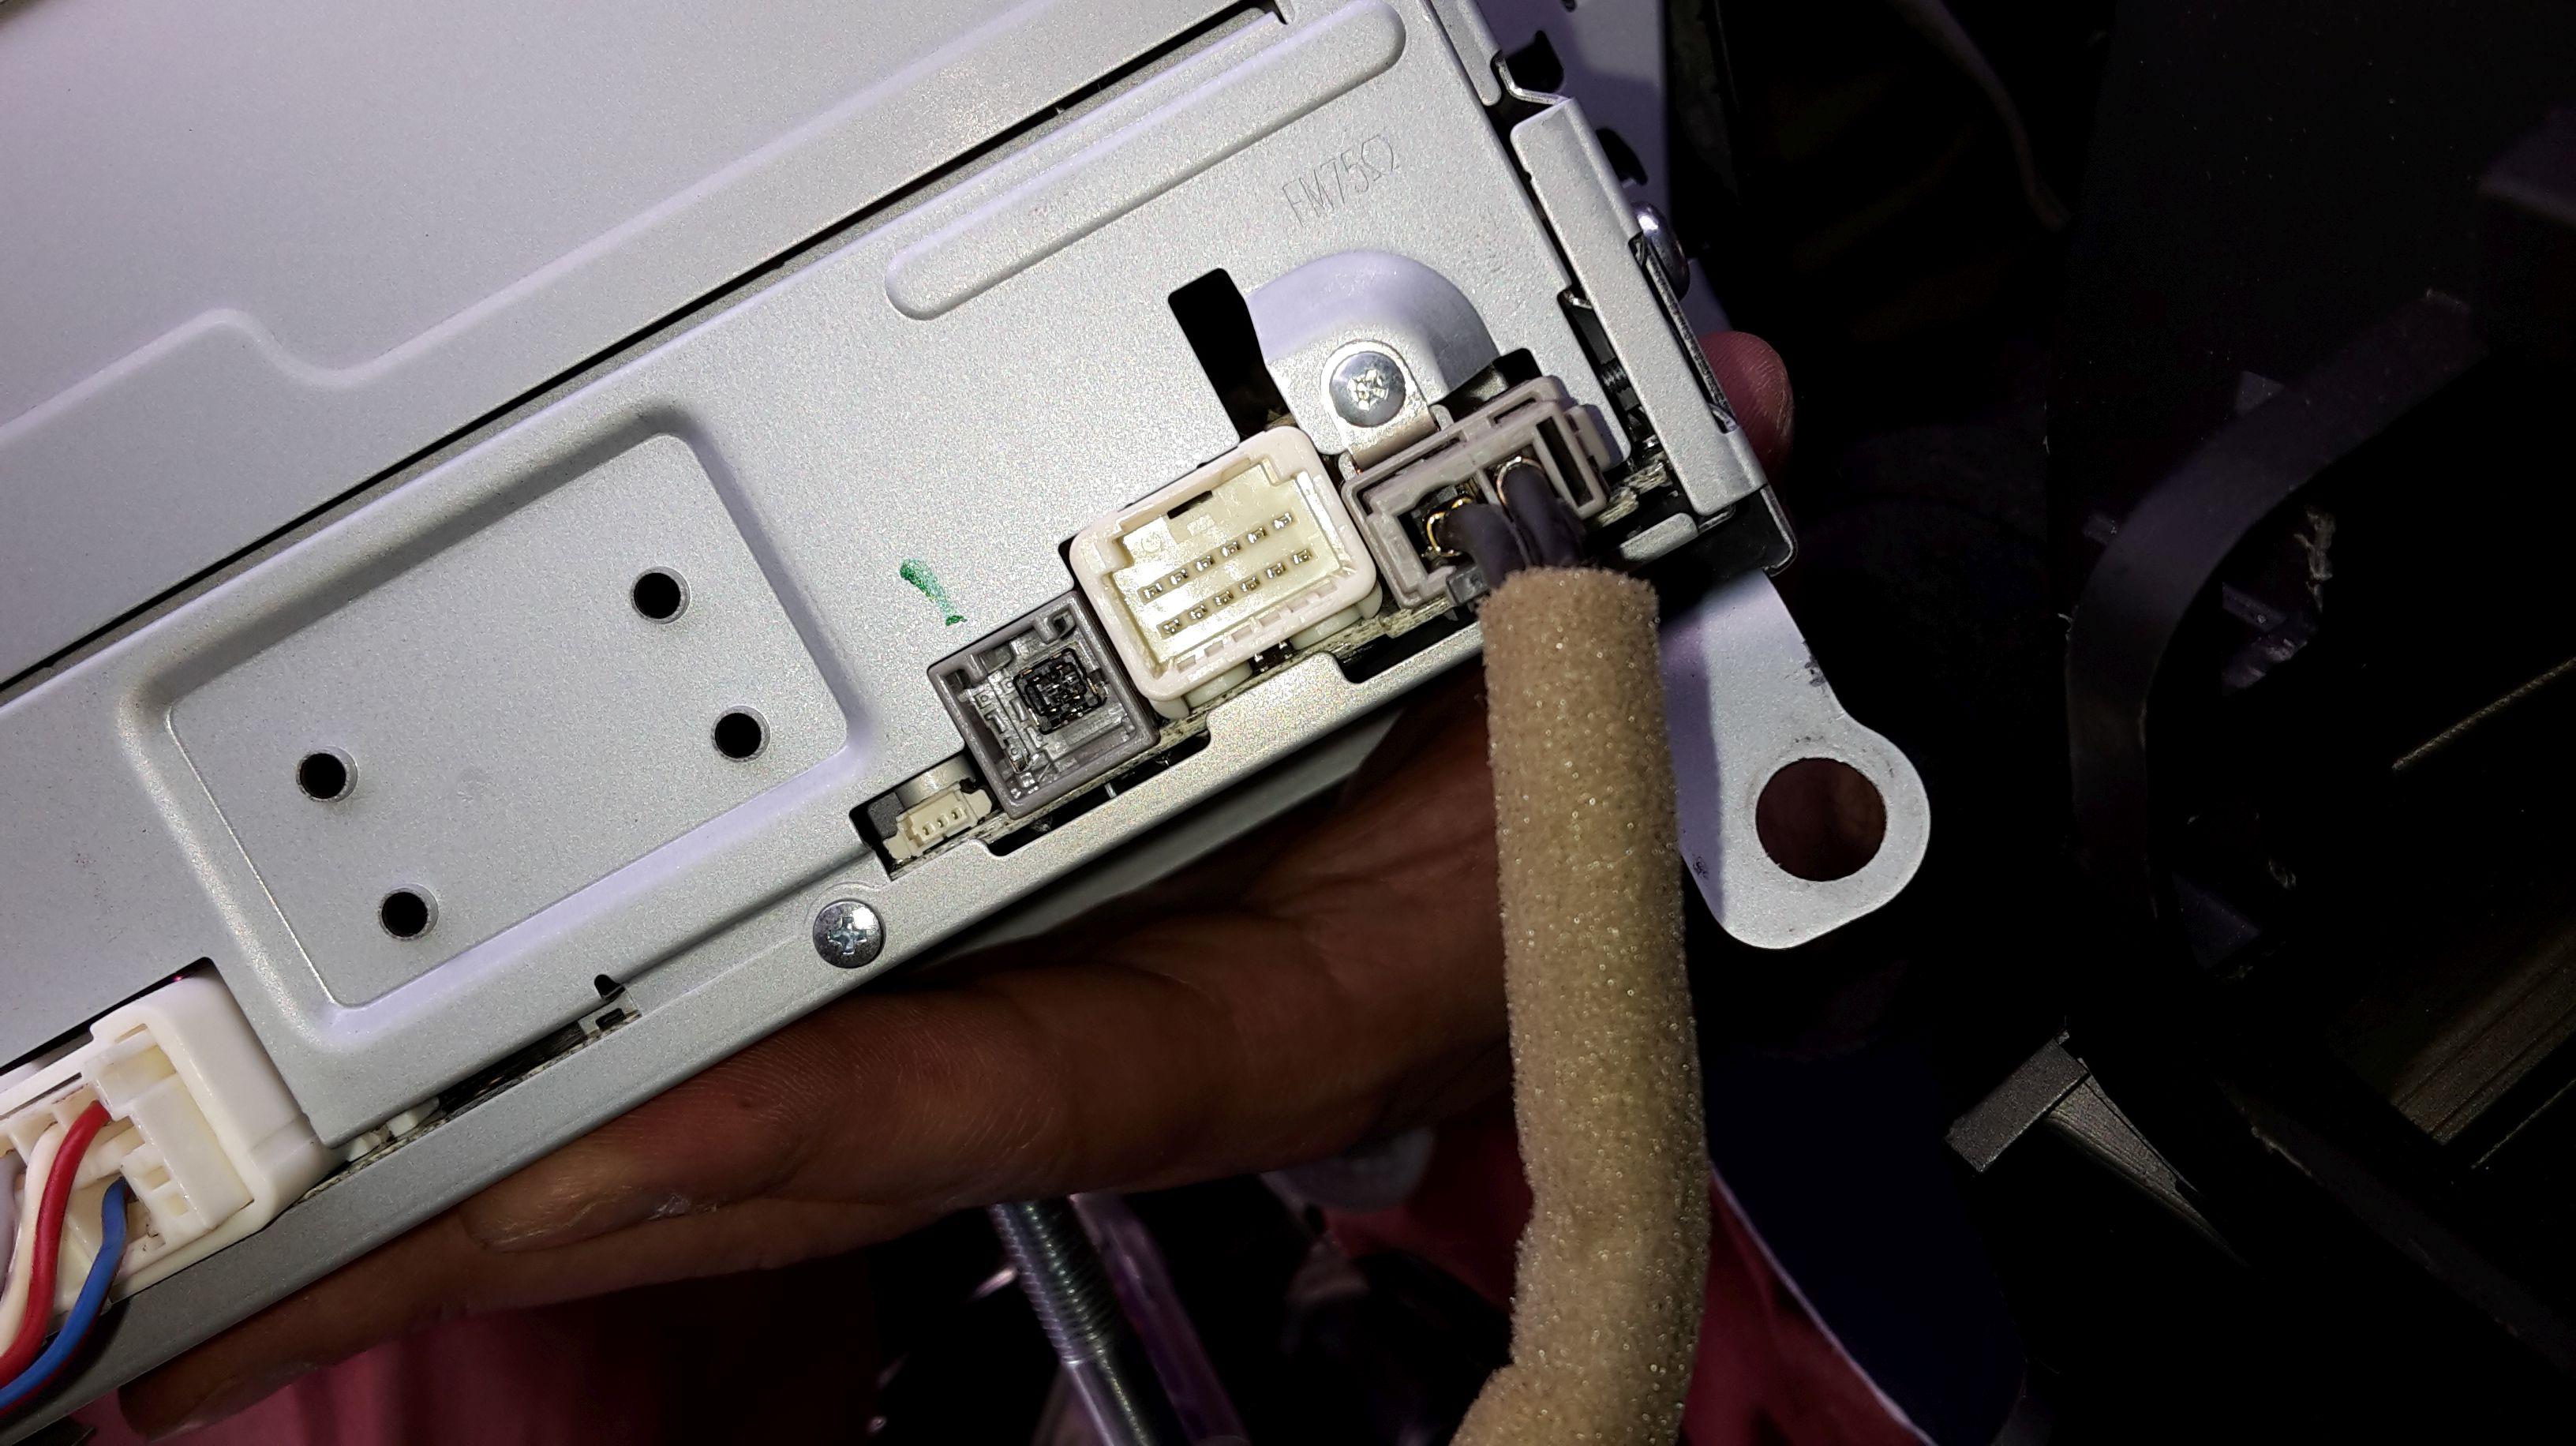 Mazda5 (CW) - Verbindung Aux-Kabel mit neuerem Mazda KA058 Autoradio